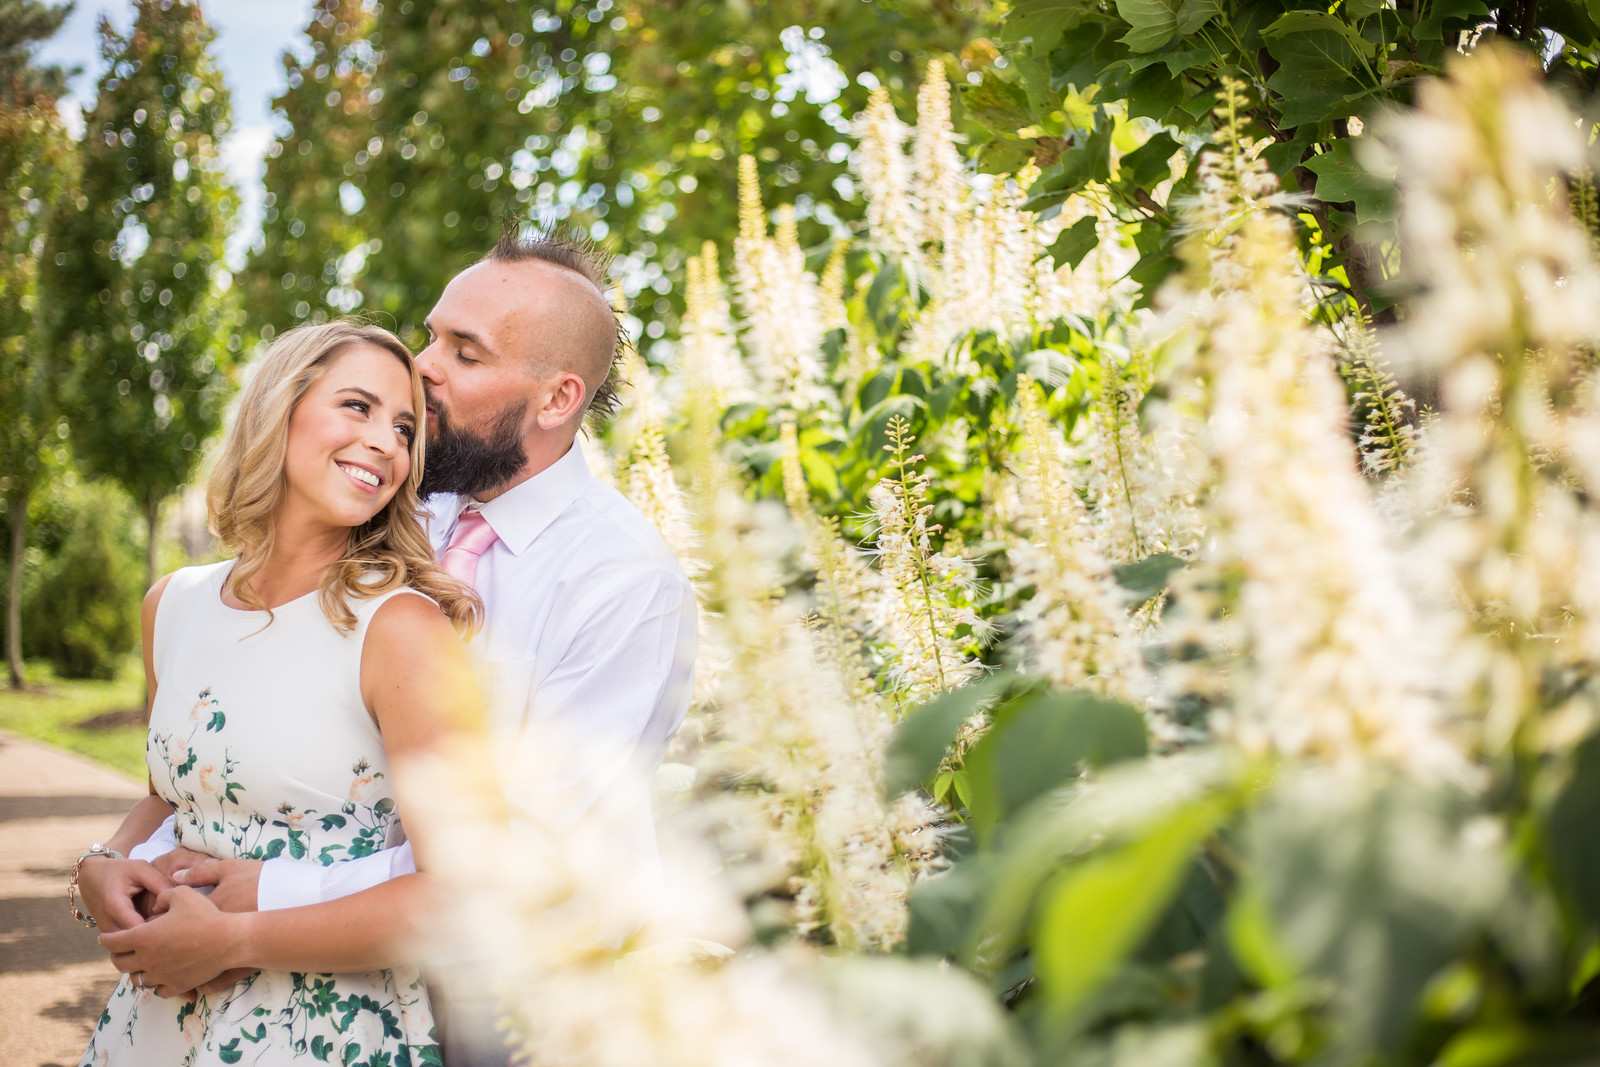 phipps-conservatory-botanical-garden-outdoor-garden-engagement-shoot-pittsburgh-manny-photographer-2